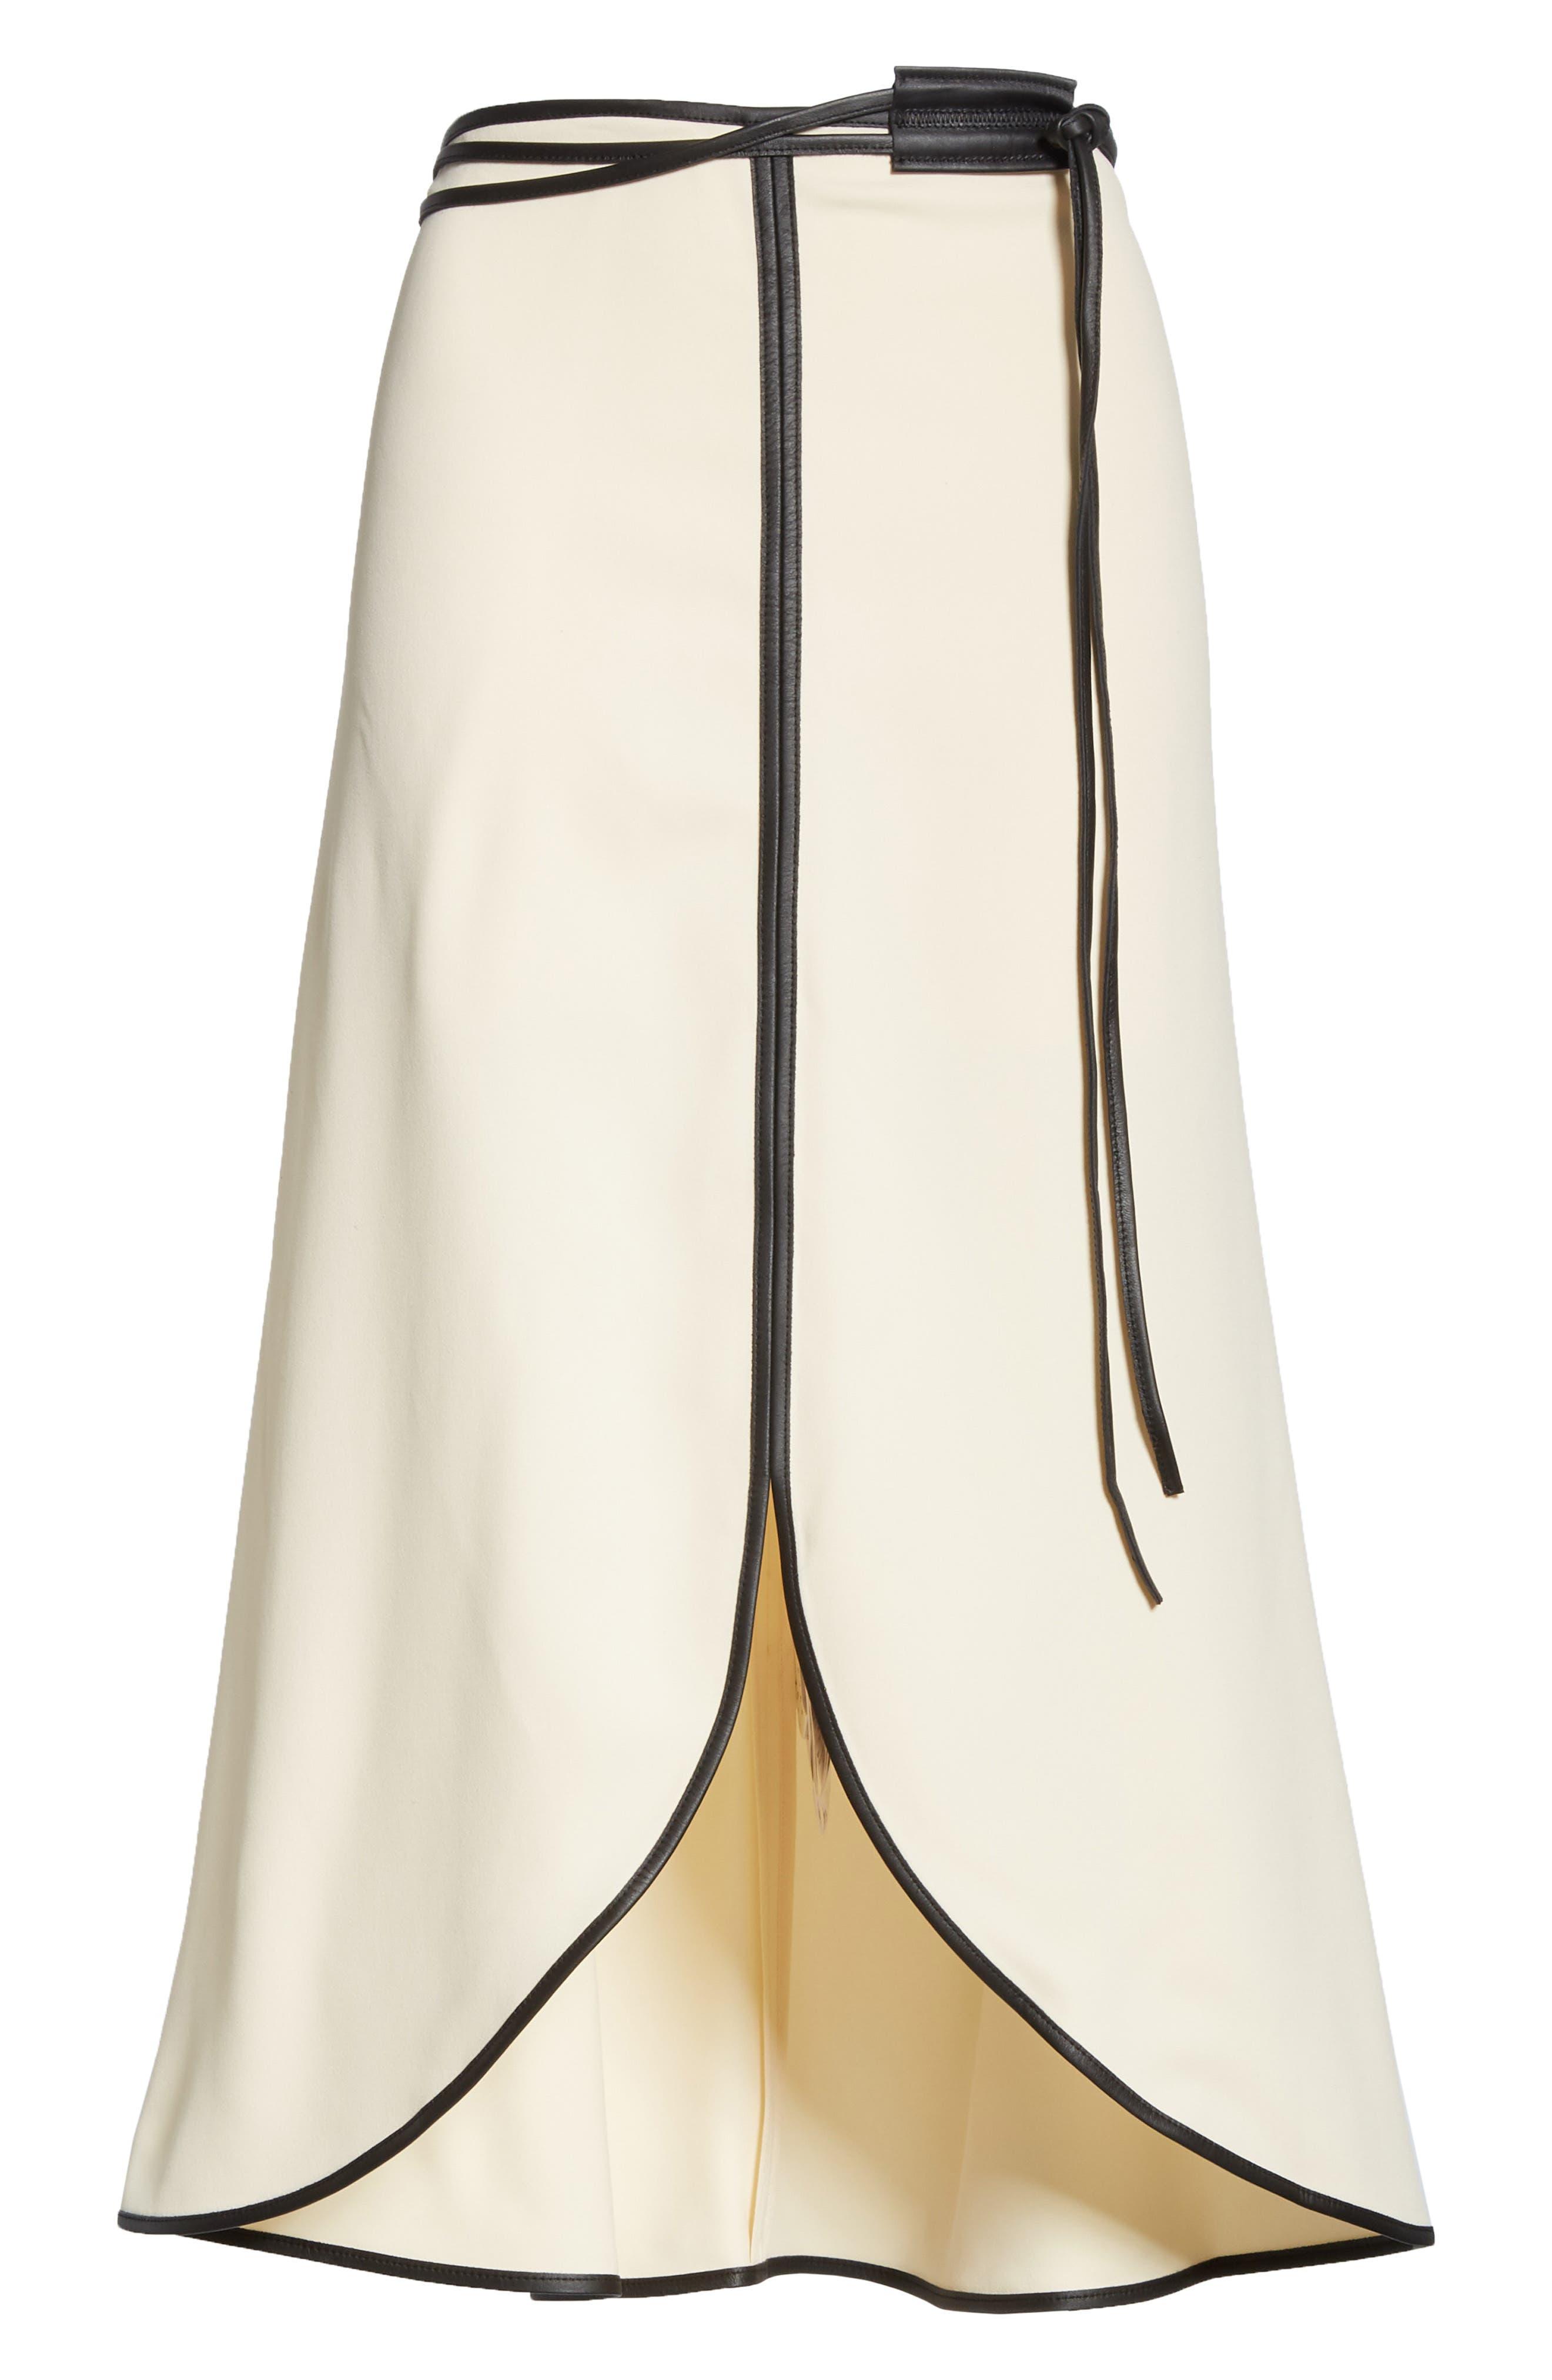 VICTORIA BECKHAM, Leather Trim Midi Skirt, Alternate thumbnail 6, color, MILK/ BLACK